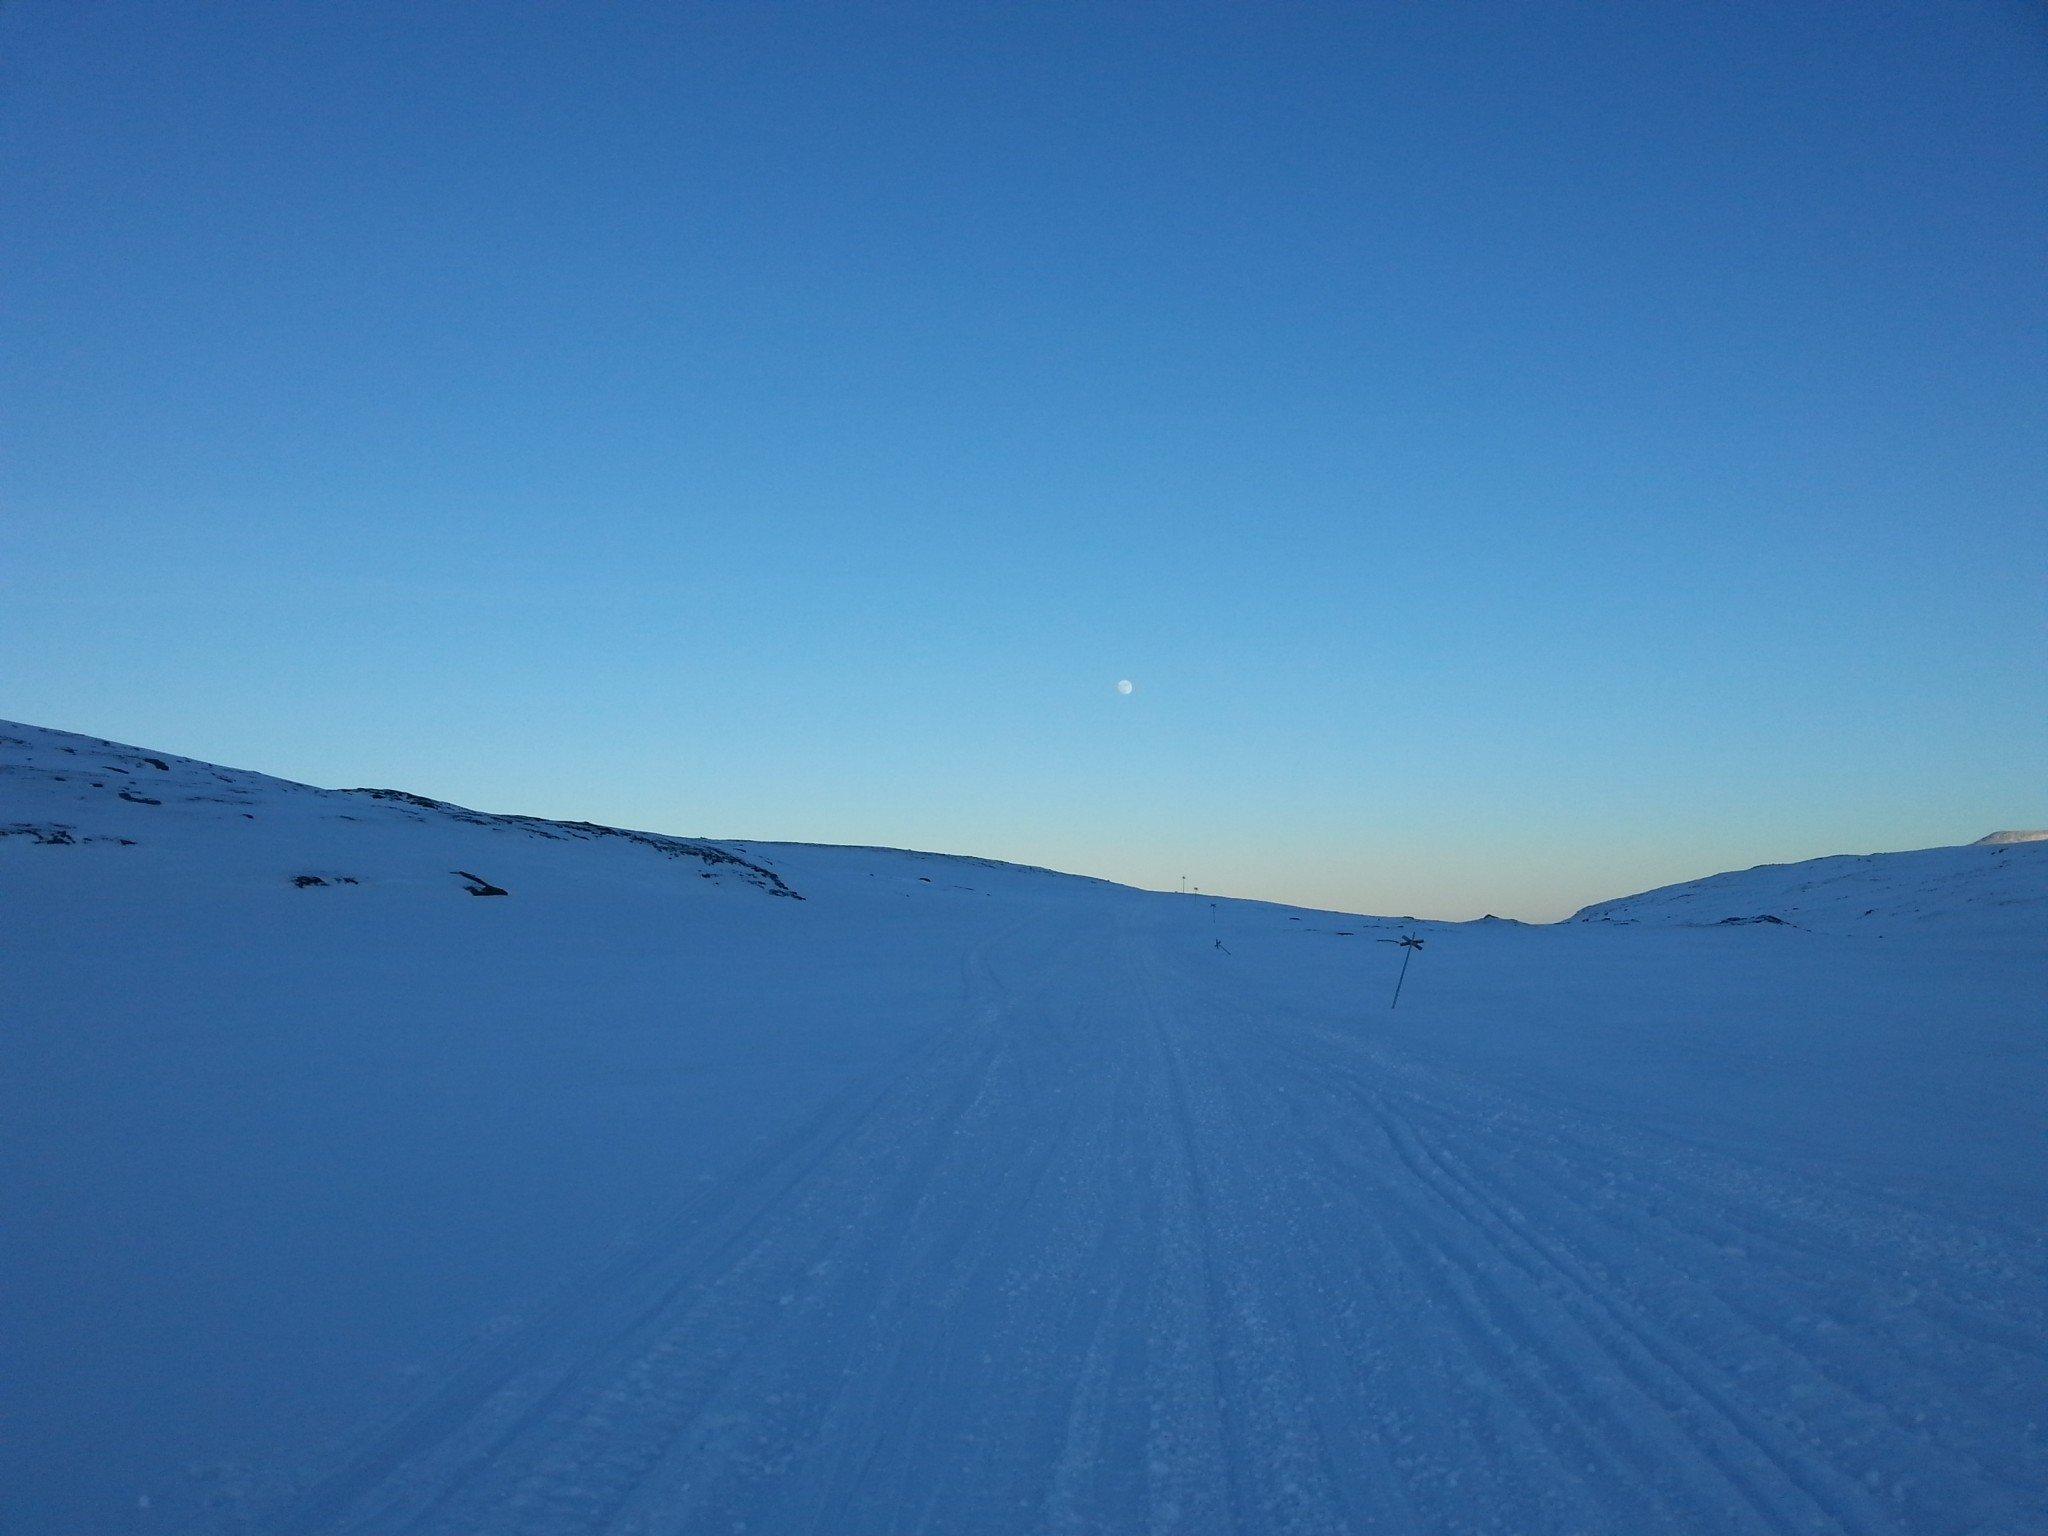 Björkliden to Låktatjåkko (176)